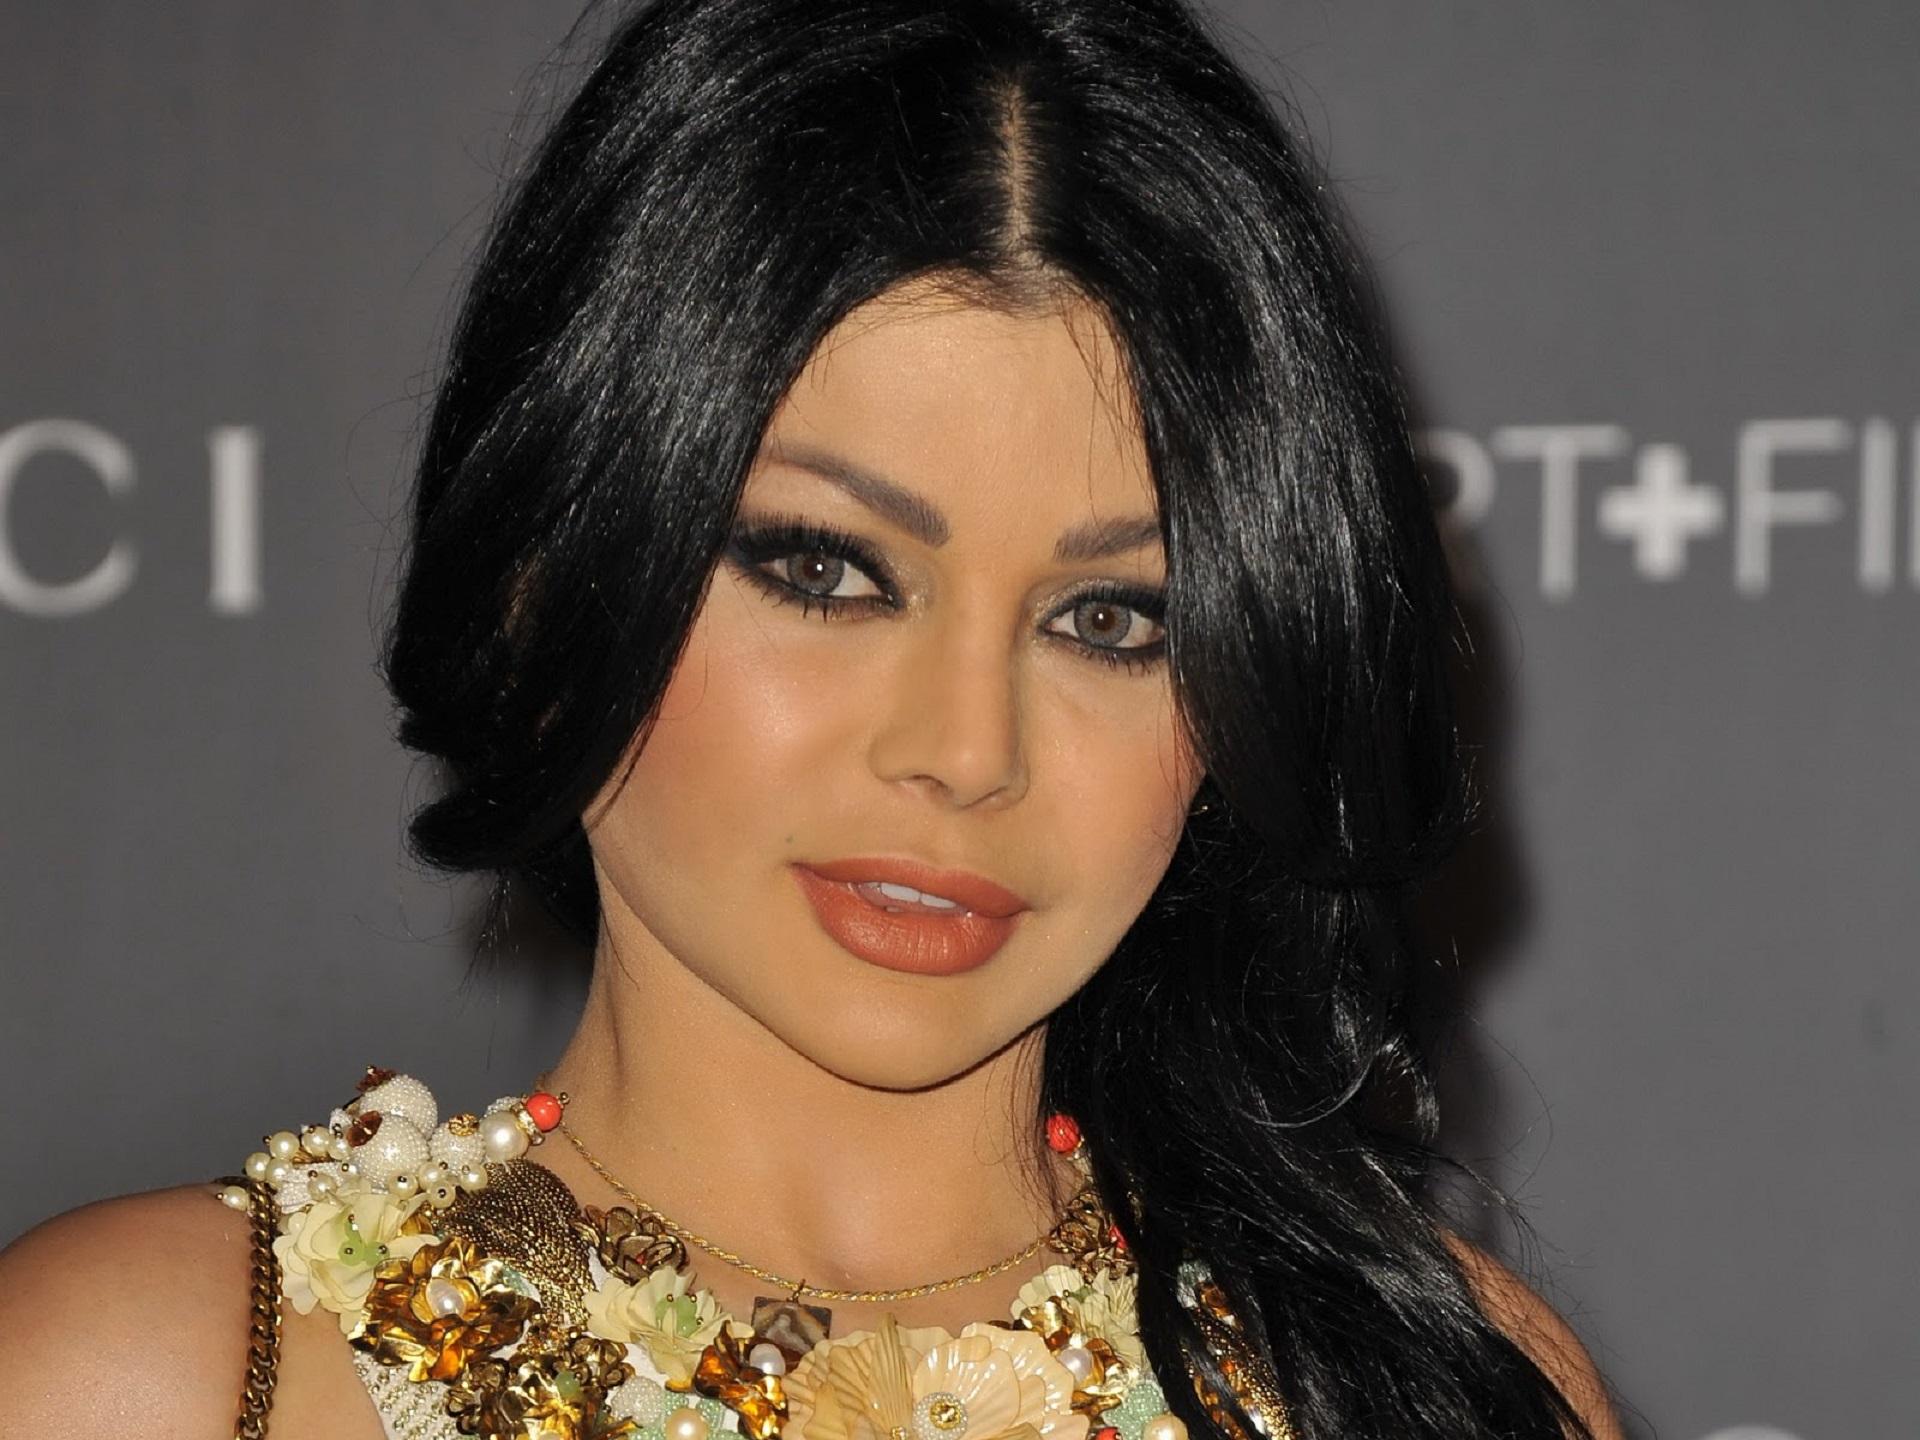 haifa wehbe celebrity wallpaper 639